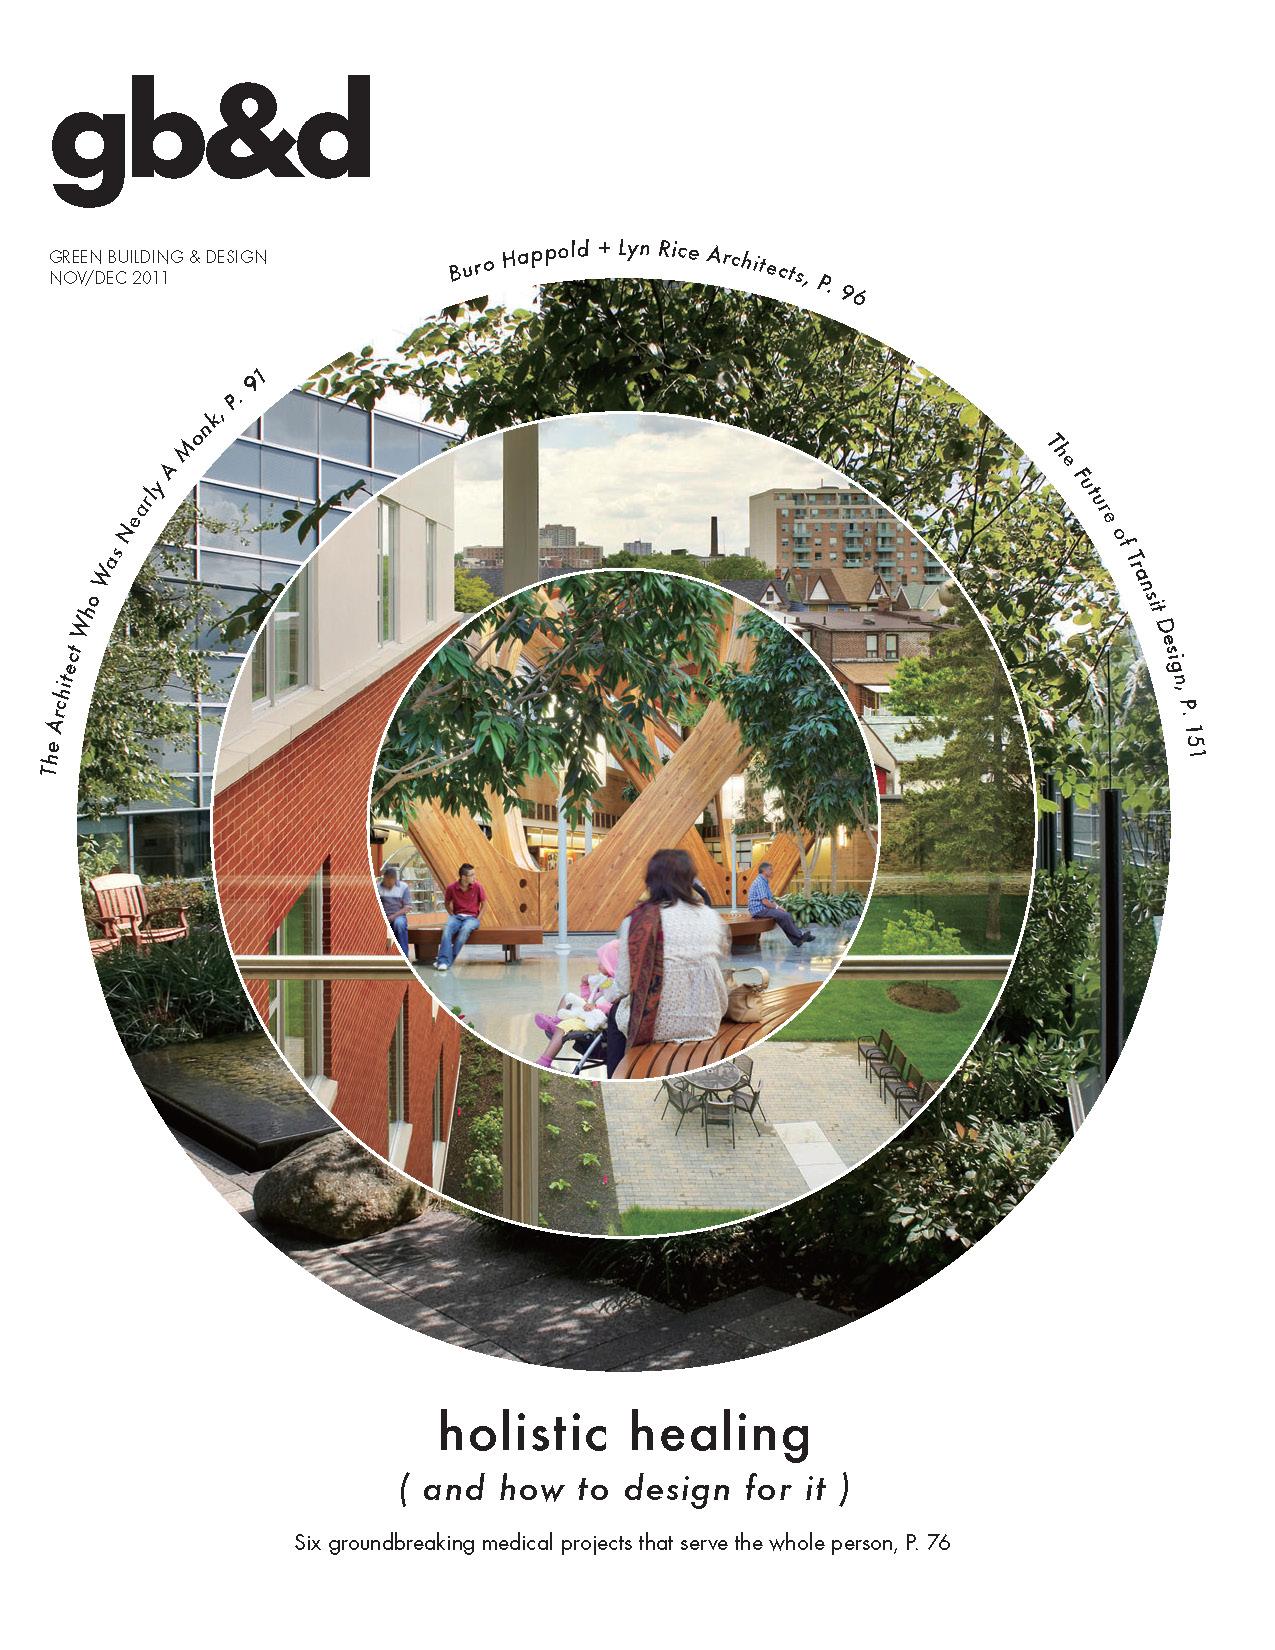 Green Building & Design magazine, December 2011